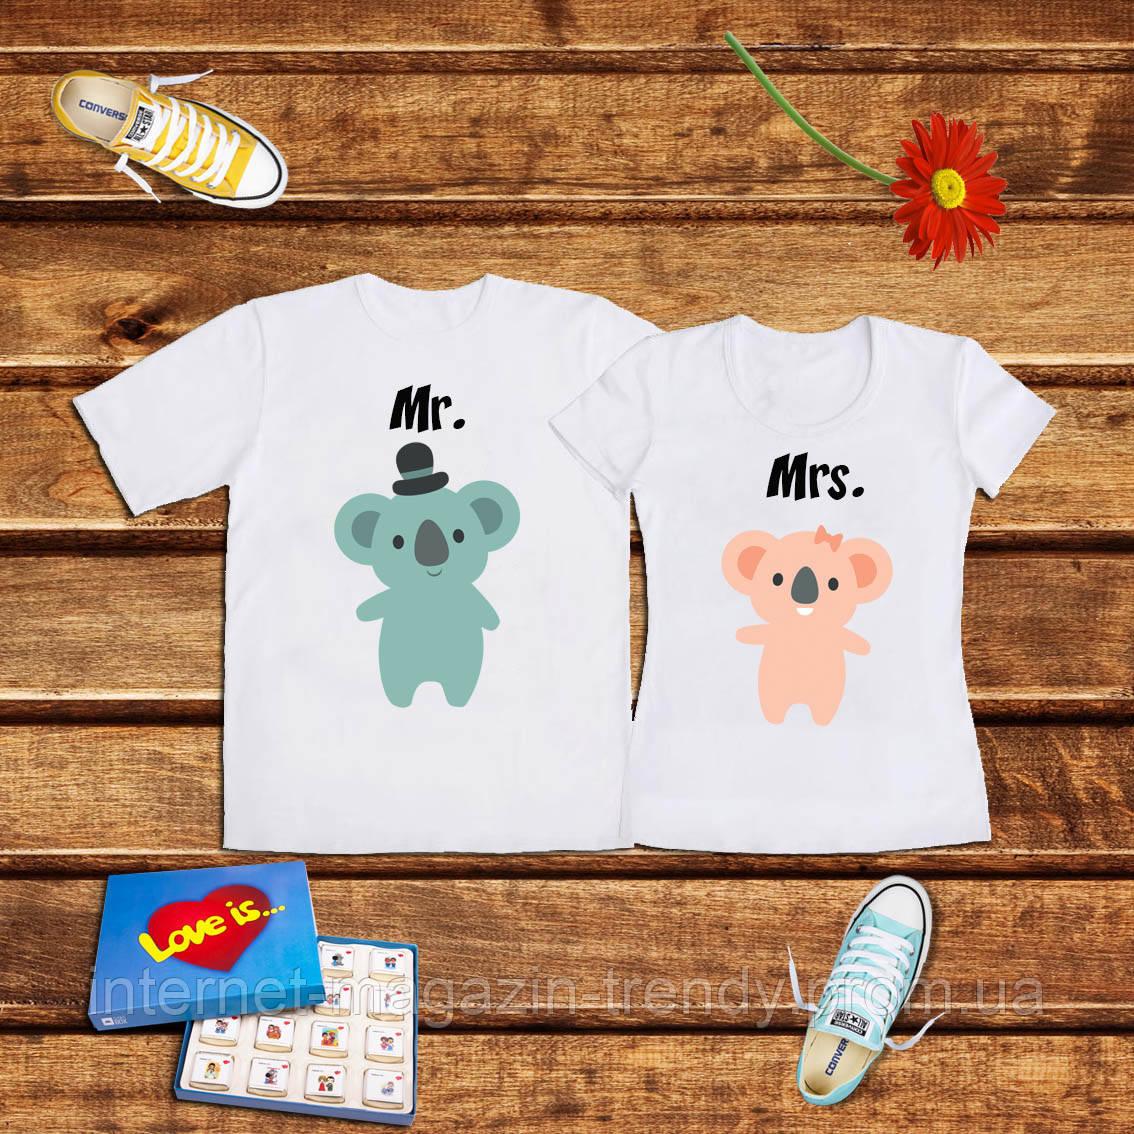 Парные футболки Mr.+Mrs. АФ55